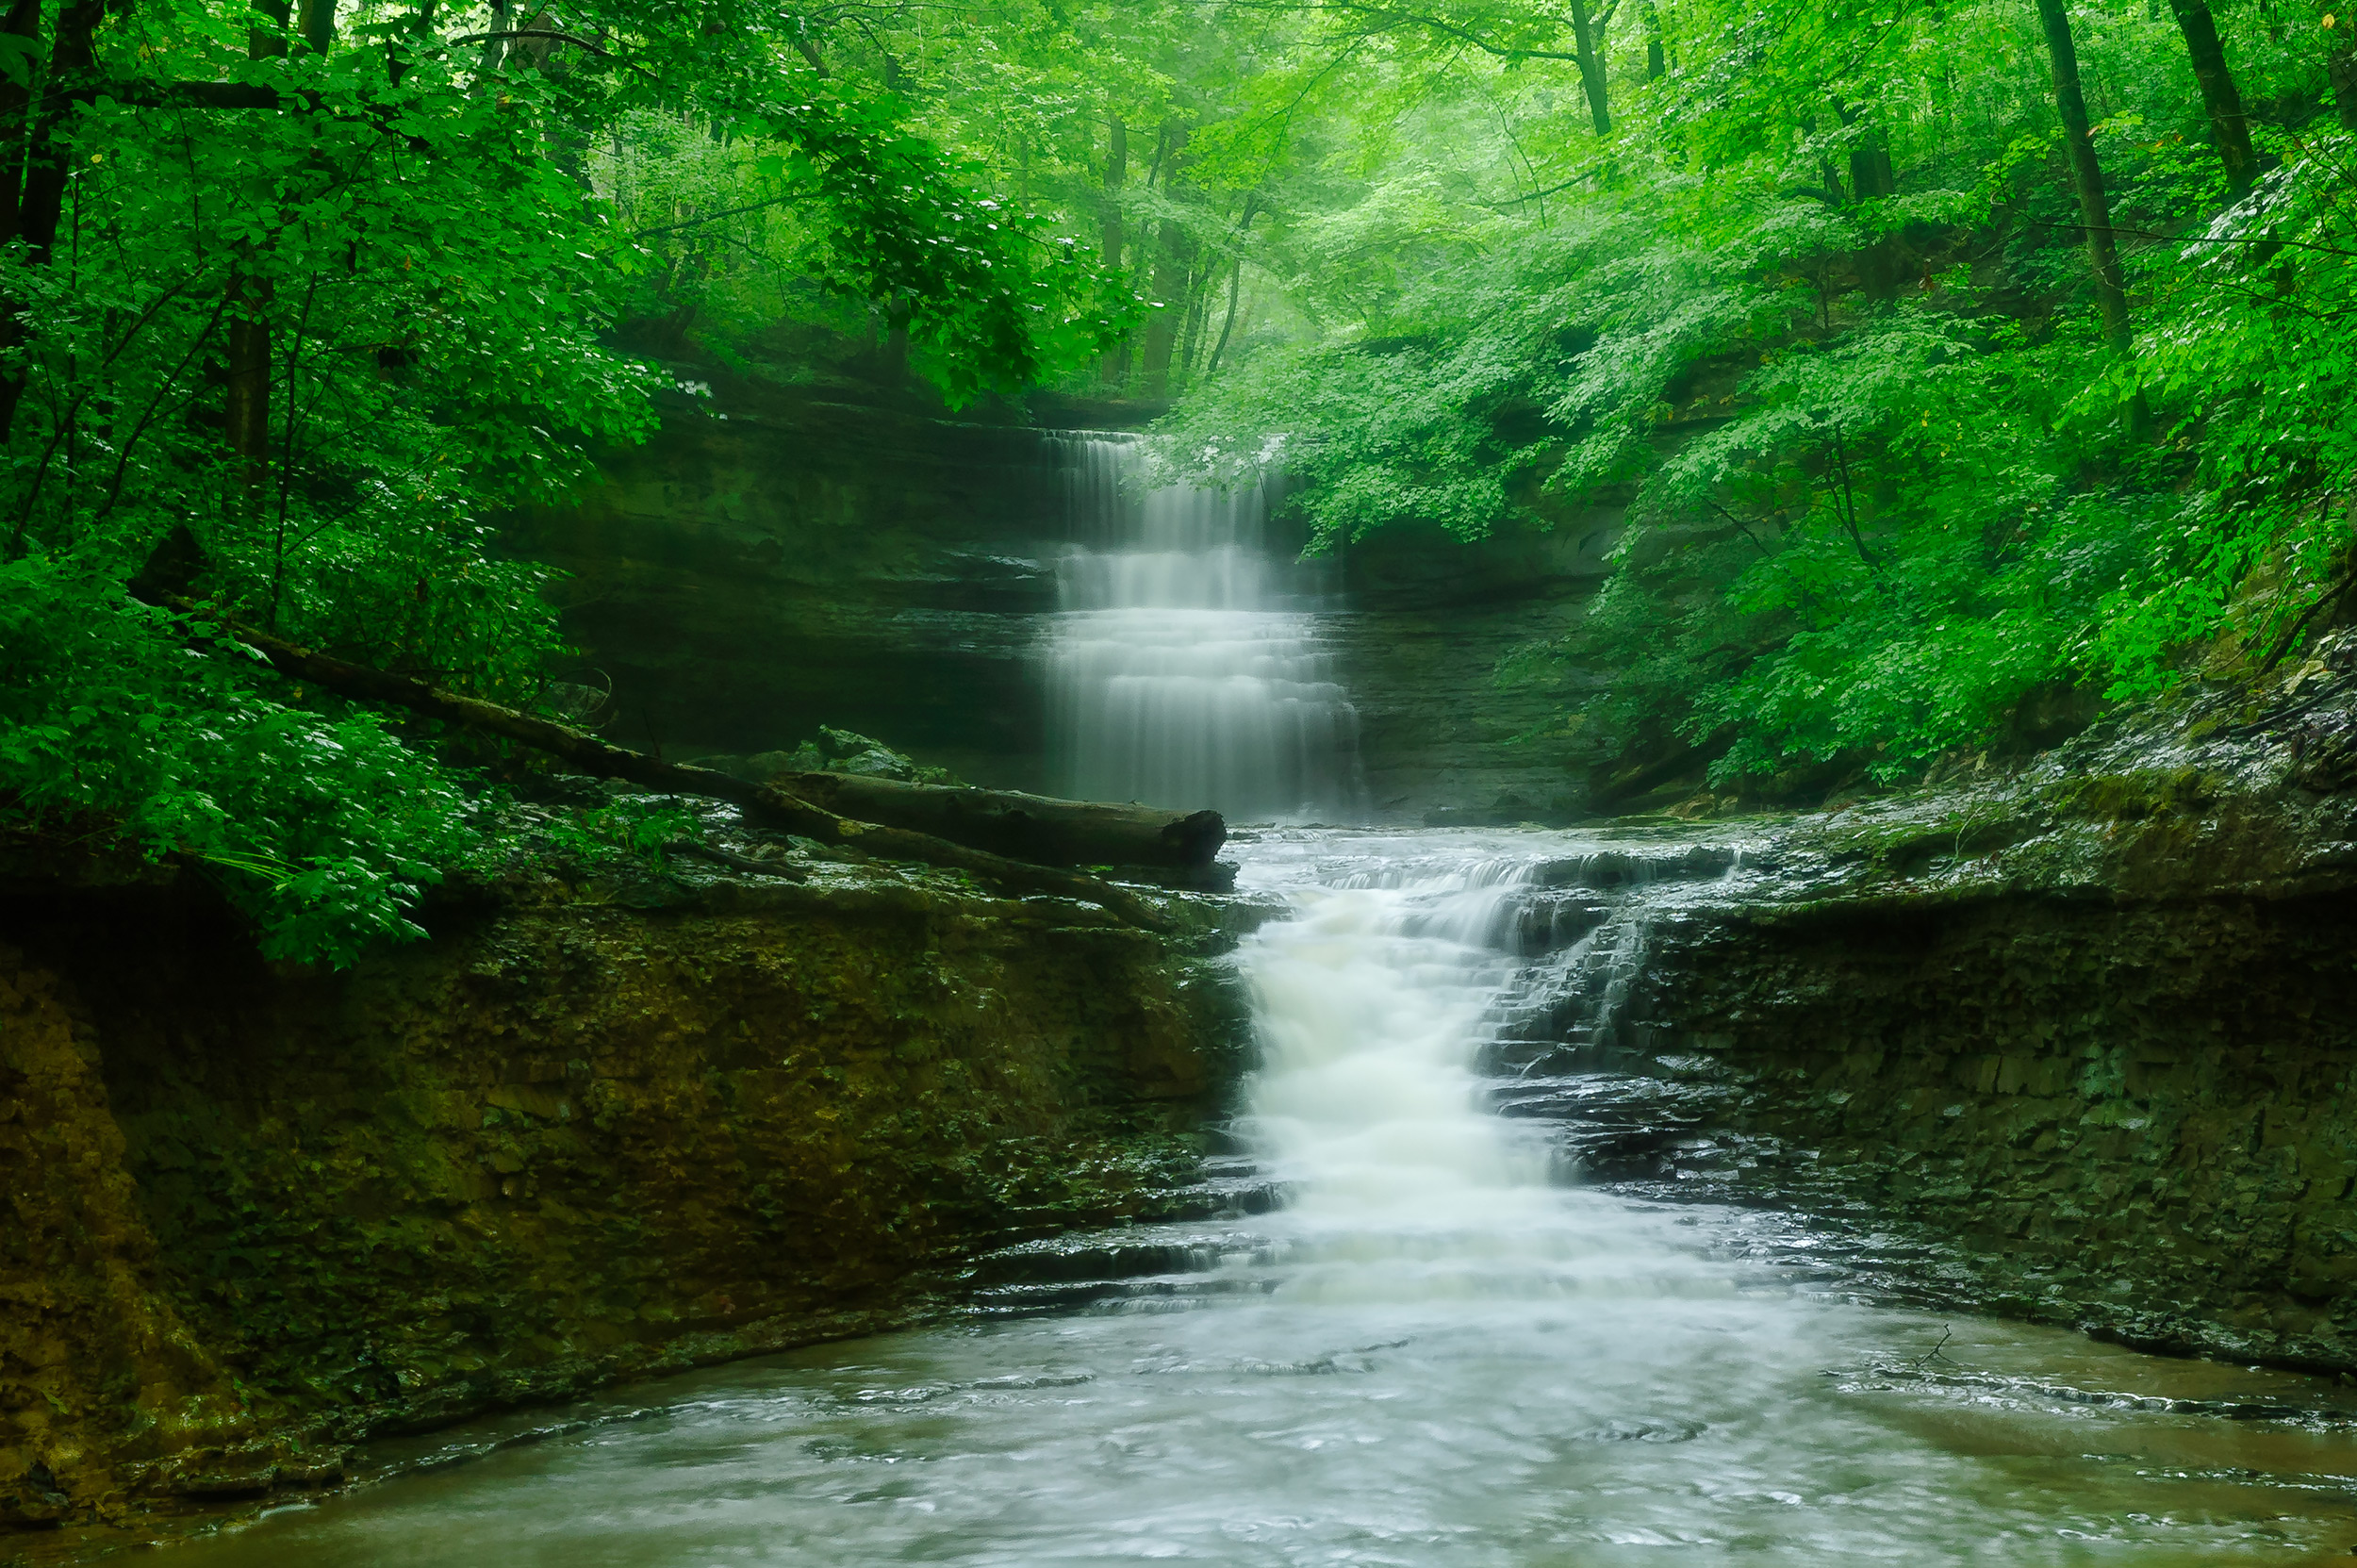 Covered-Bridge-Road-Falls-Kentucky-2004-001-Edit.jpg